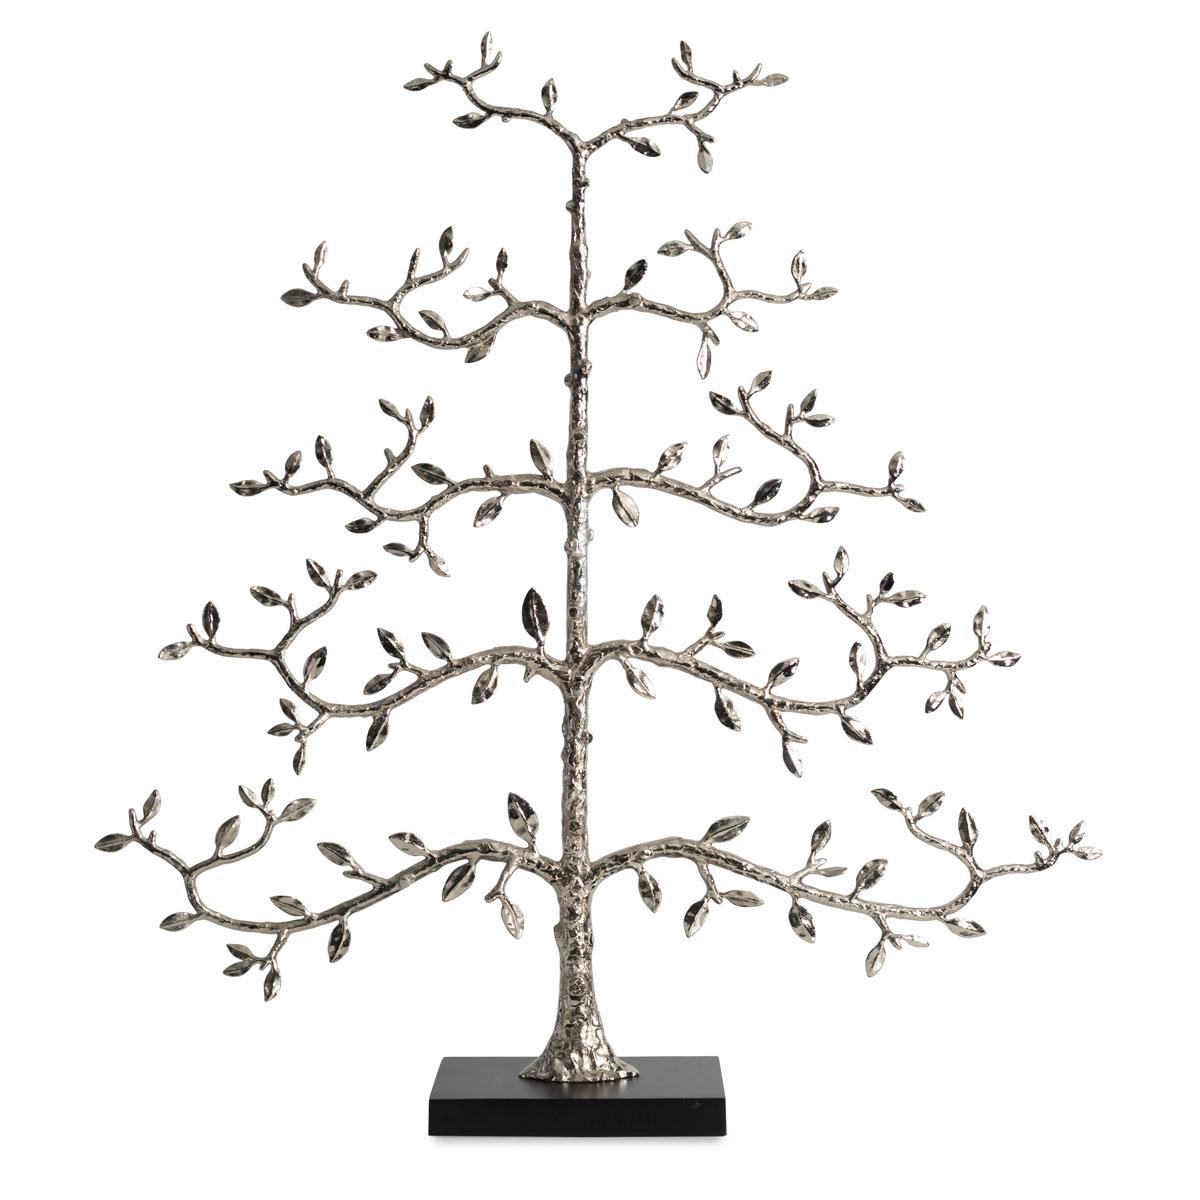 Michael Aram Espalier Small Tree Sculpture